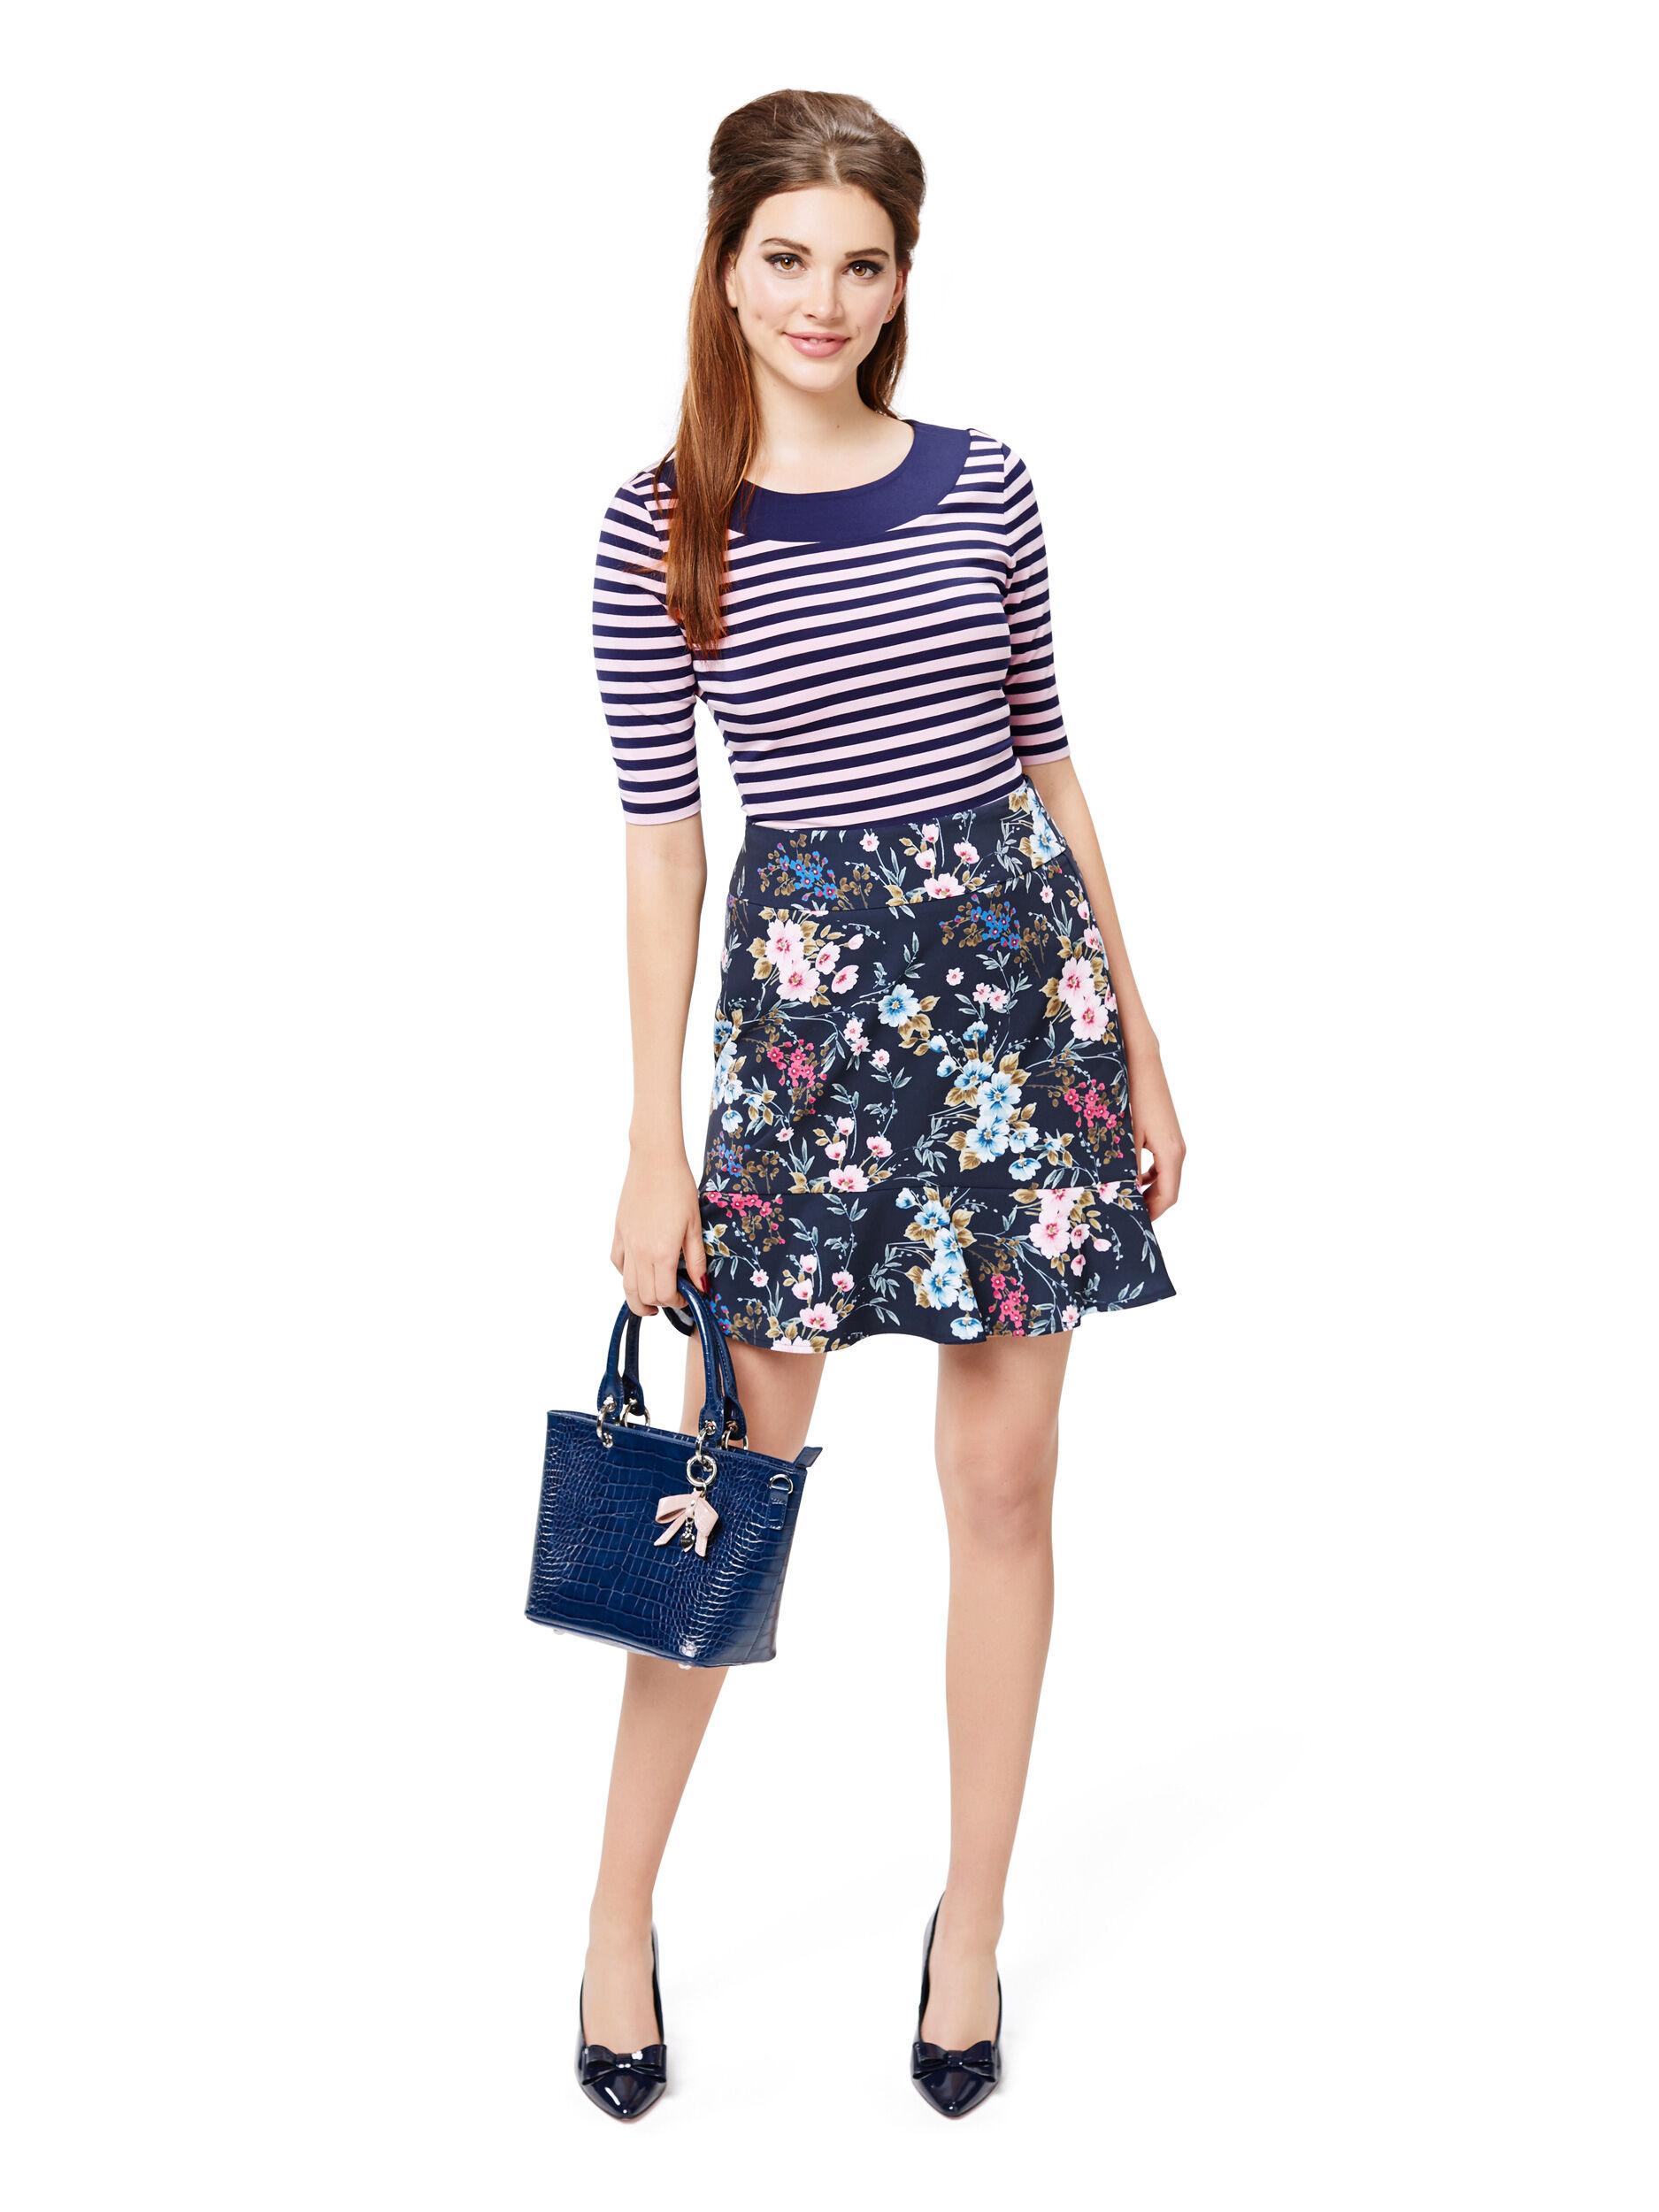 Esmeralda Floral Skirt